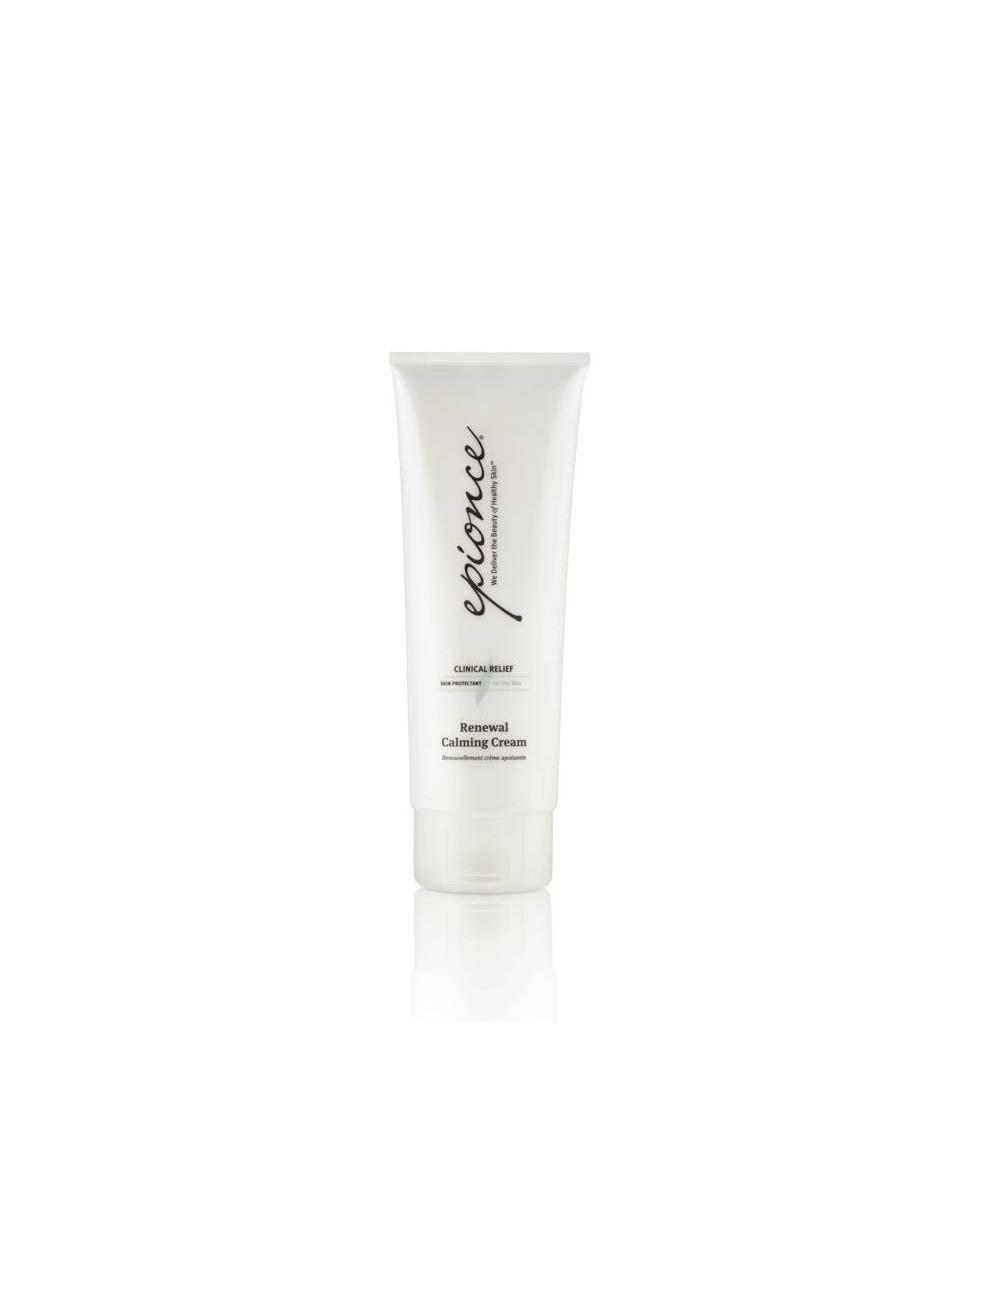 Epionce Renewal Calming Cream 230ml